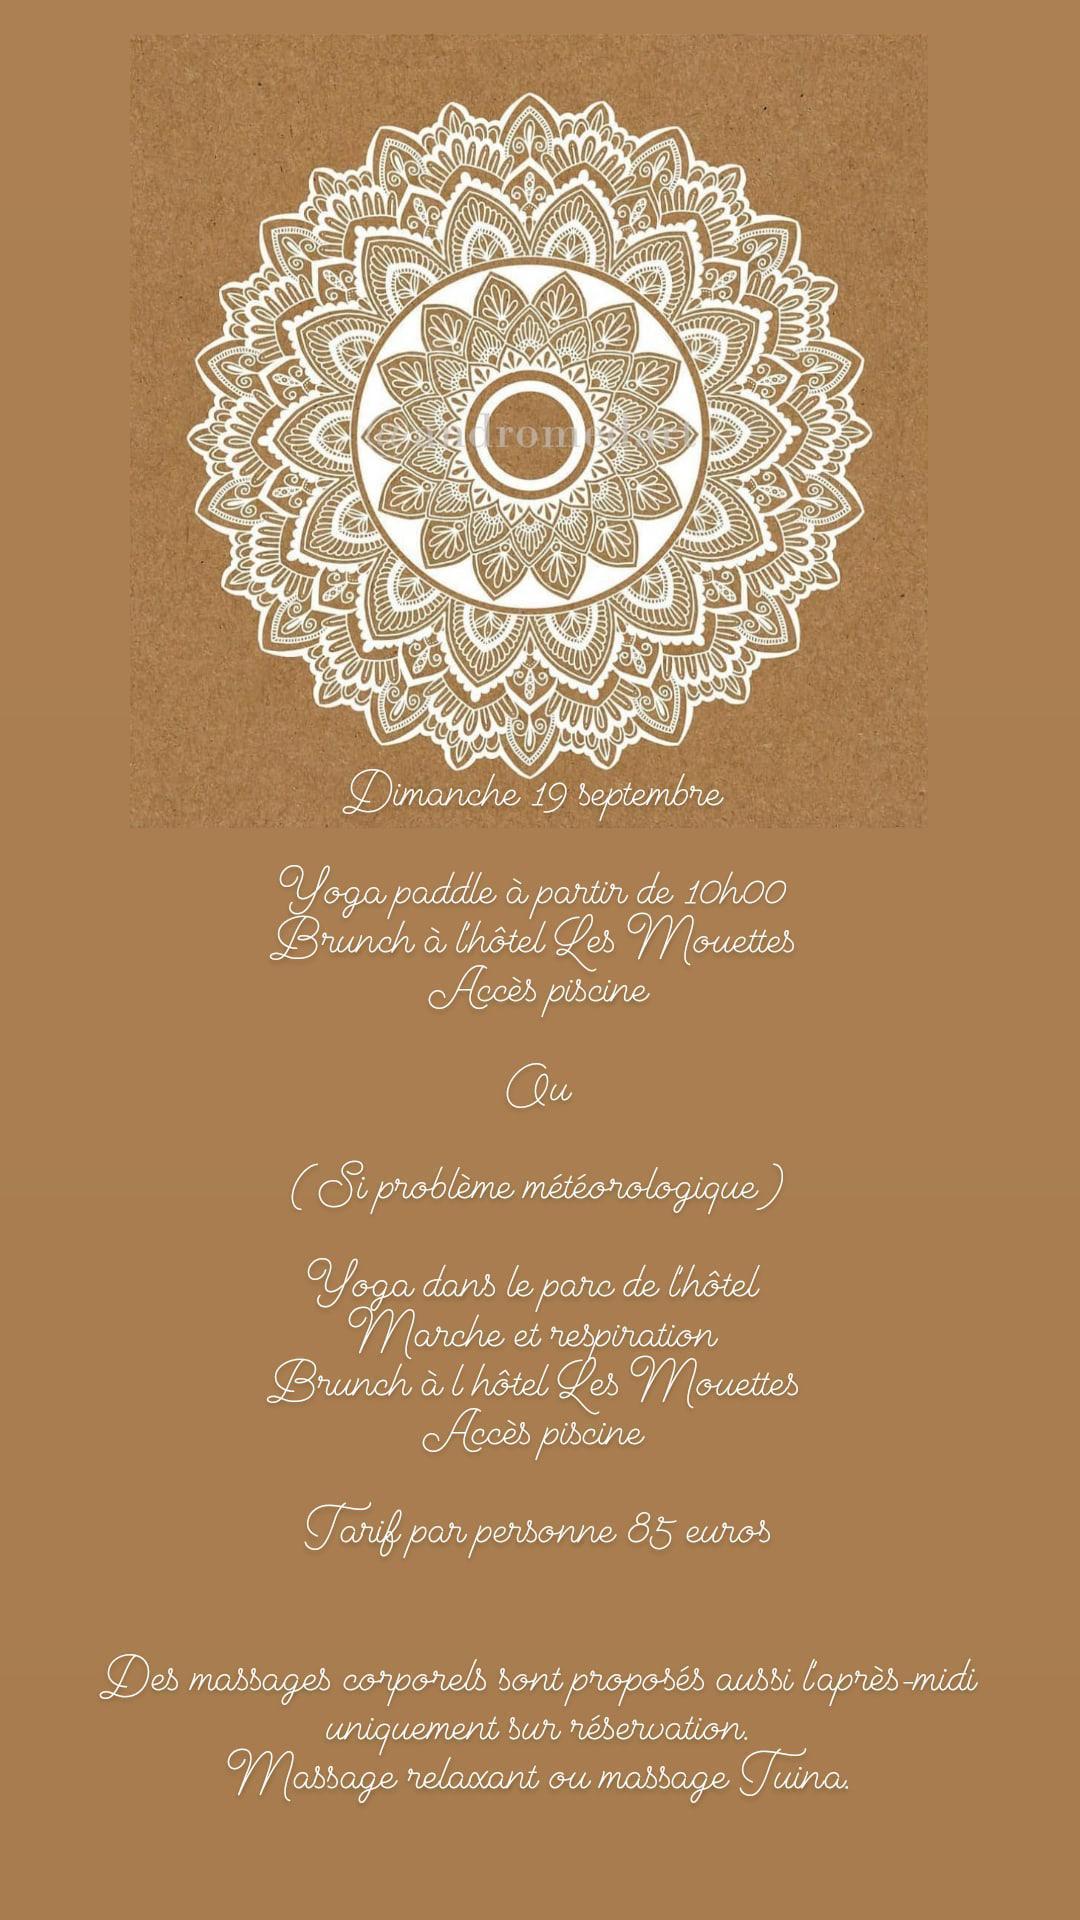 Hôtel les Mouettes | Lozari | Promo